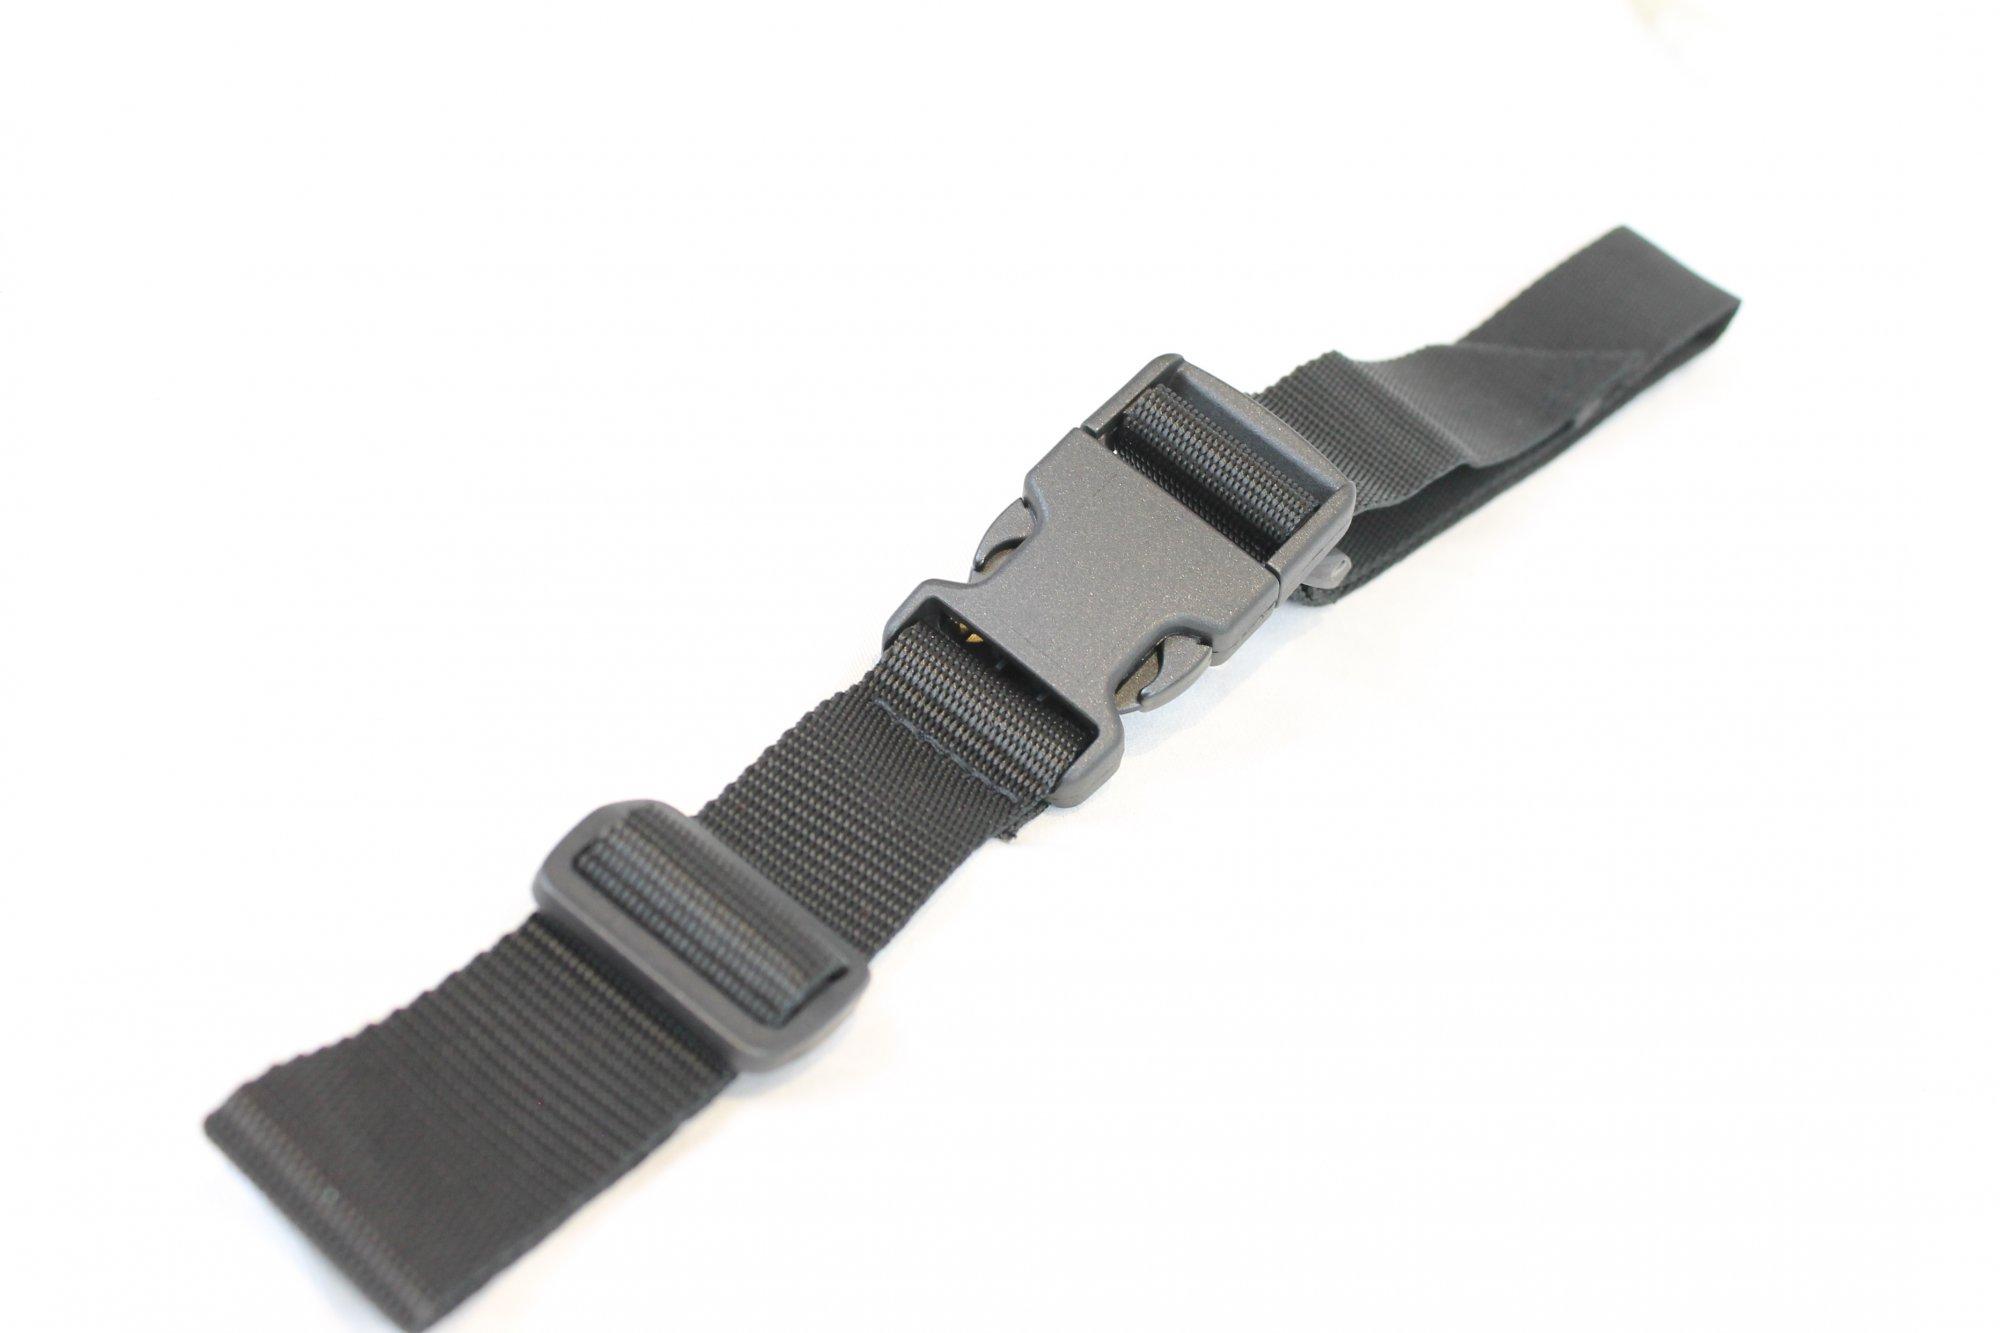 NEW Black Fuselli Nylon Back Strap - Adjustable 10 to 26